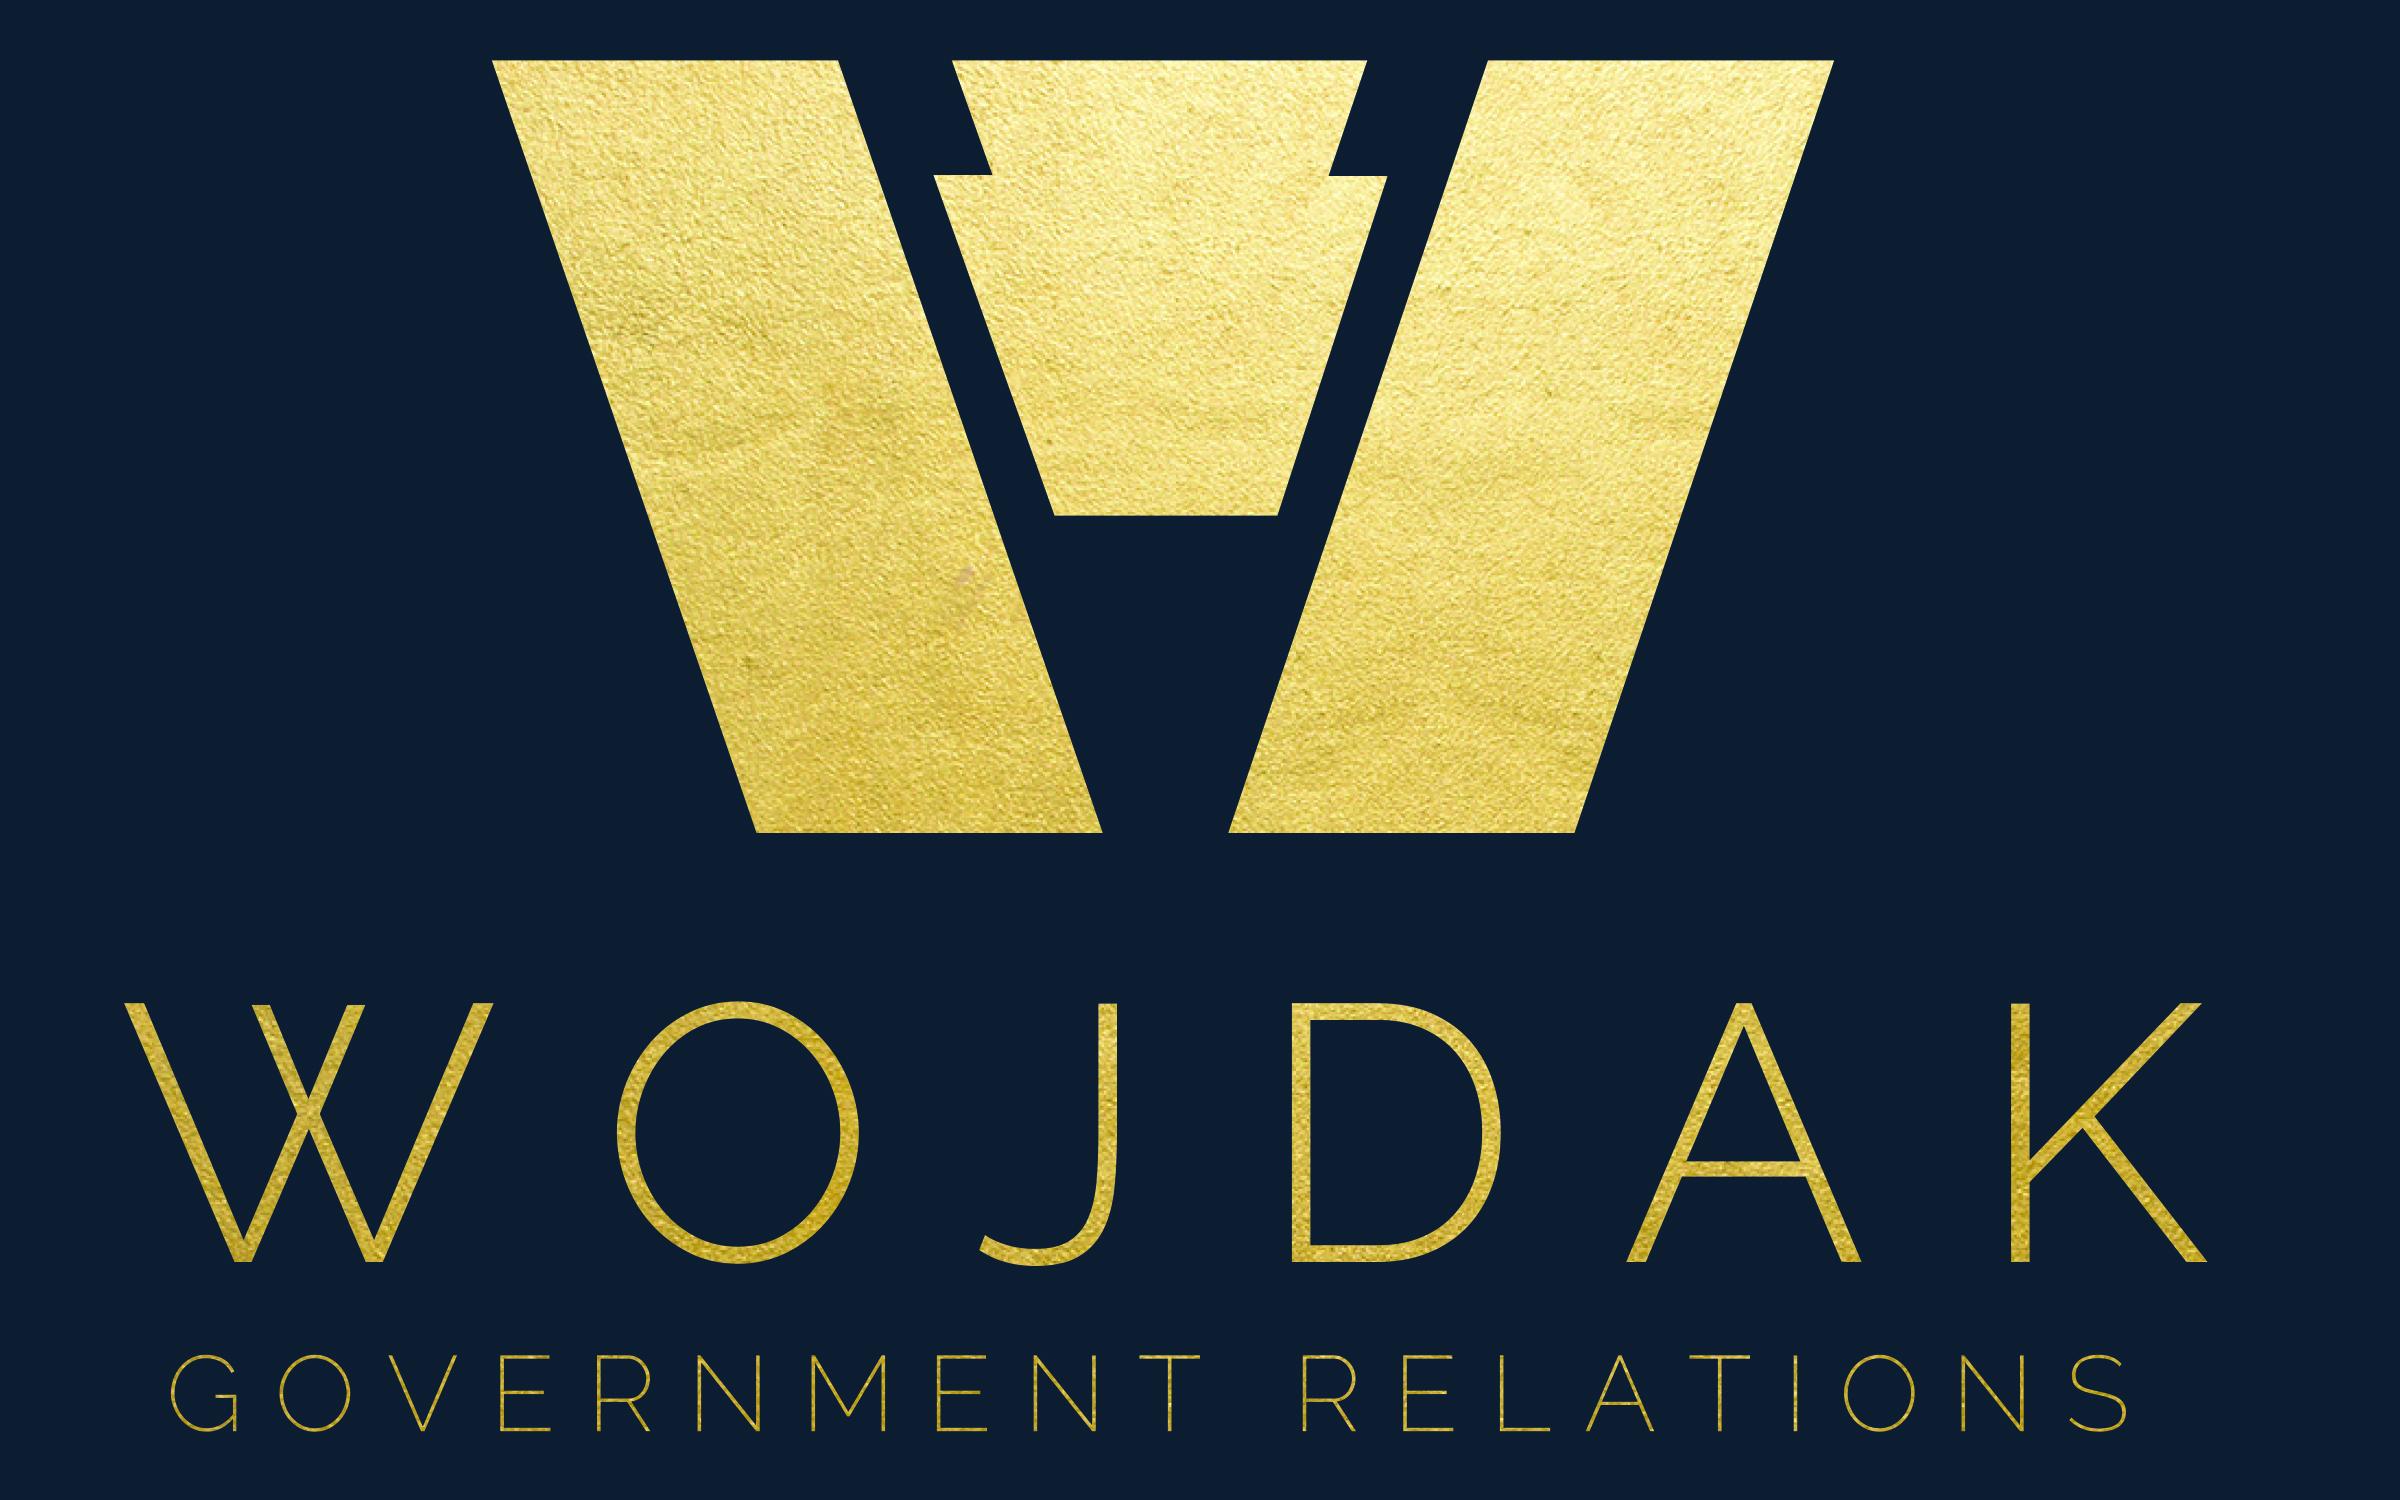 Wojdak Government Relations